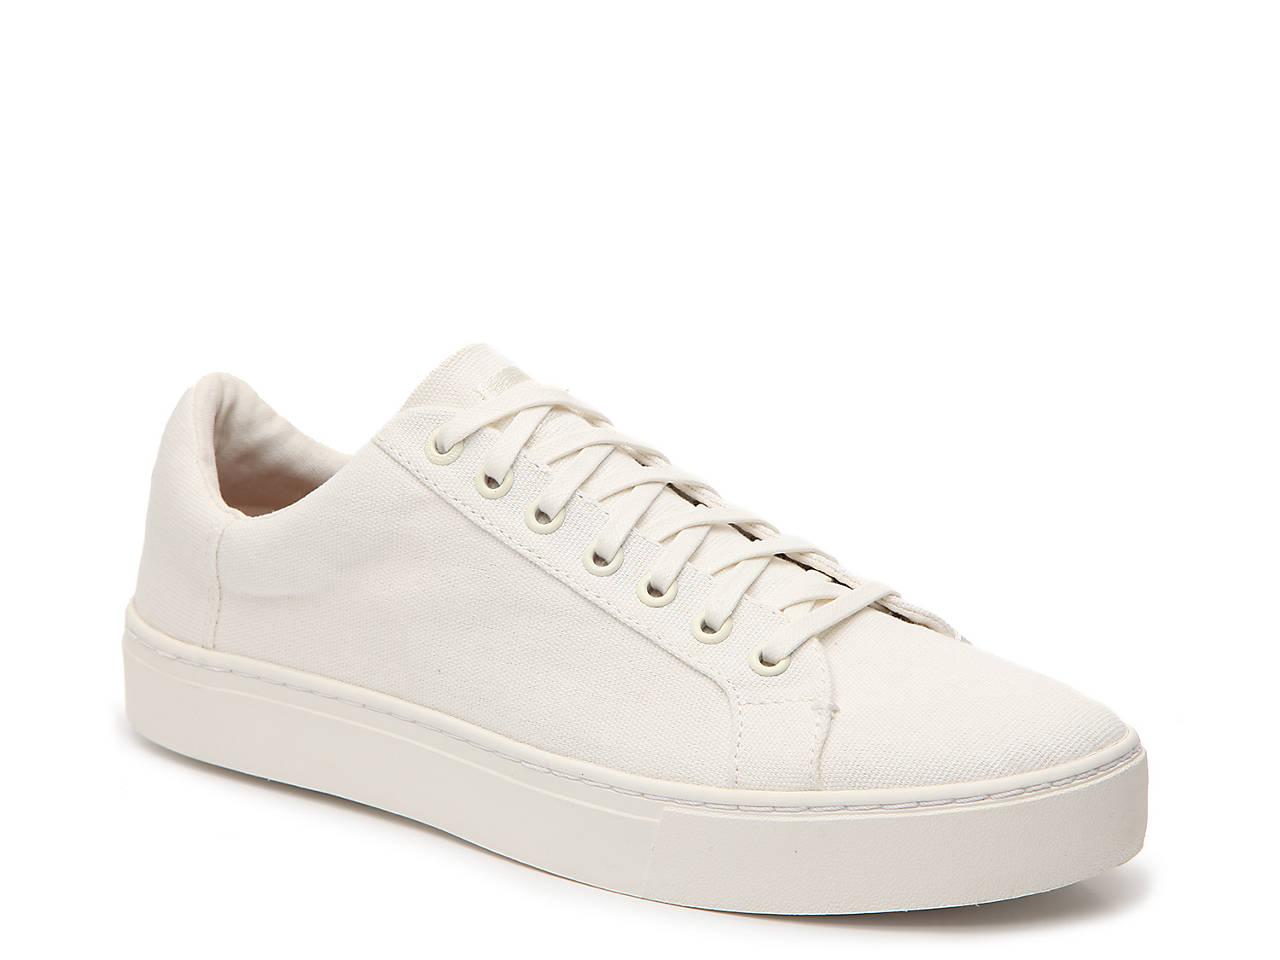 aec36e4eb0f TOMS Lenox Sneaker Men s Shoes